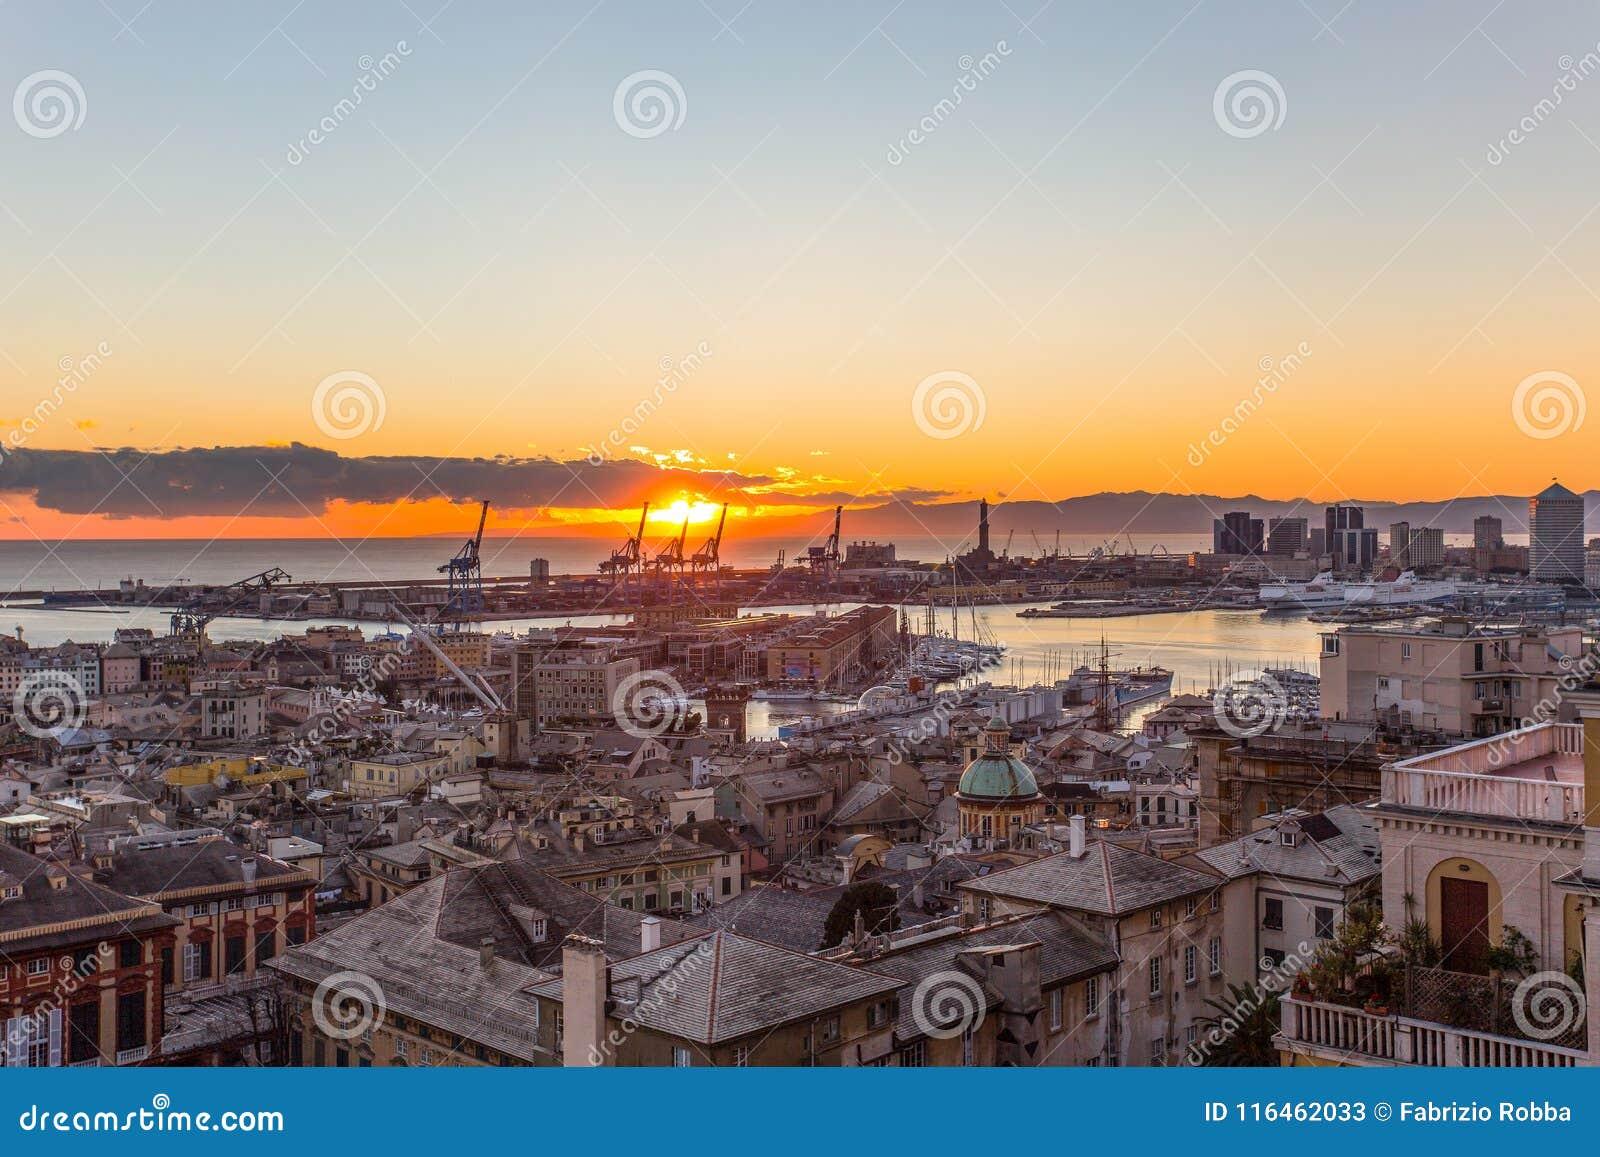 Sunset view of the city of Genoa, Italy/ Genoa landscape/ Genoa Skyline/ city landscape/ aereal view/ light/ city light/ orange/ s